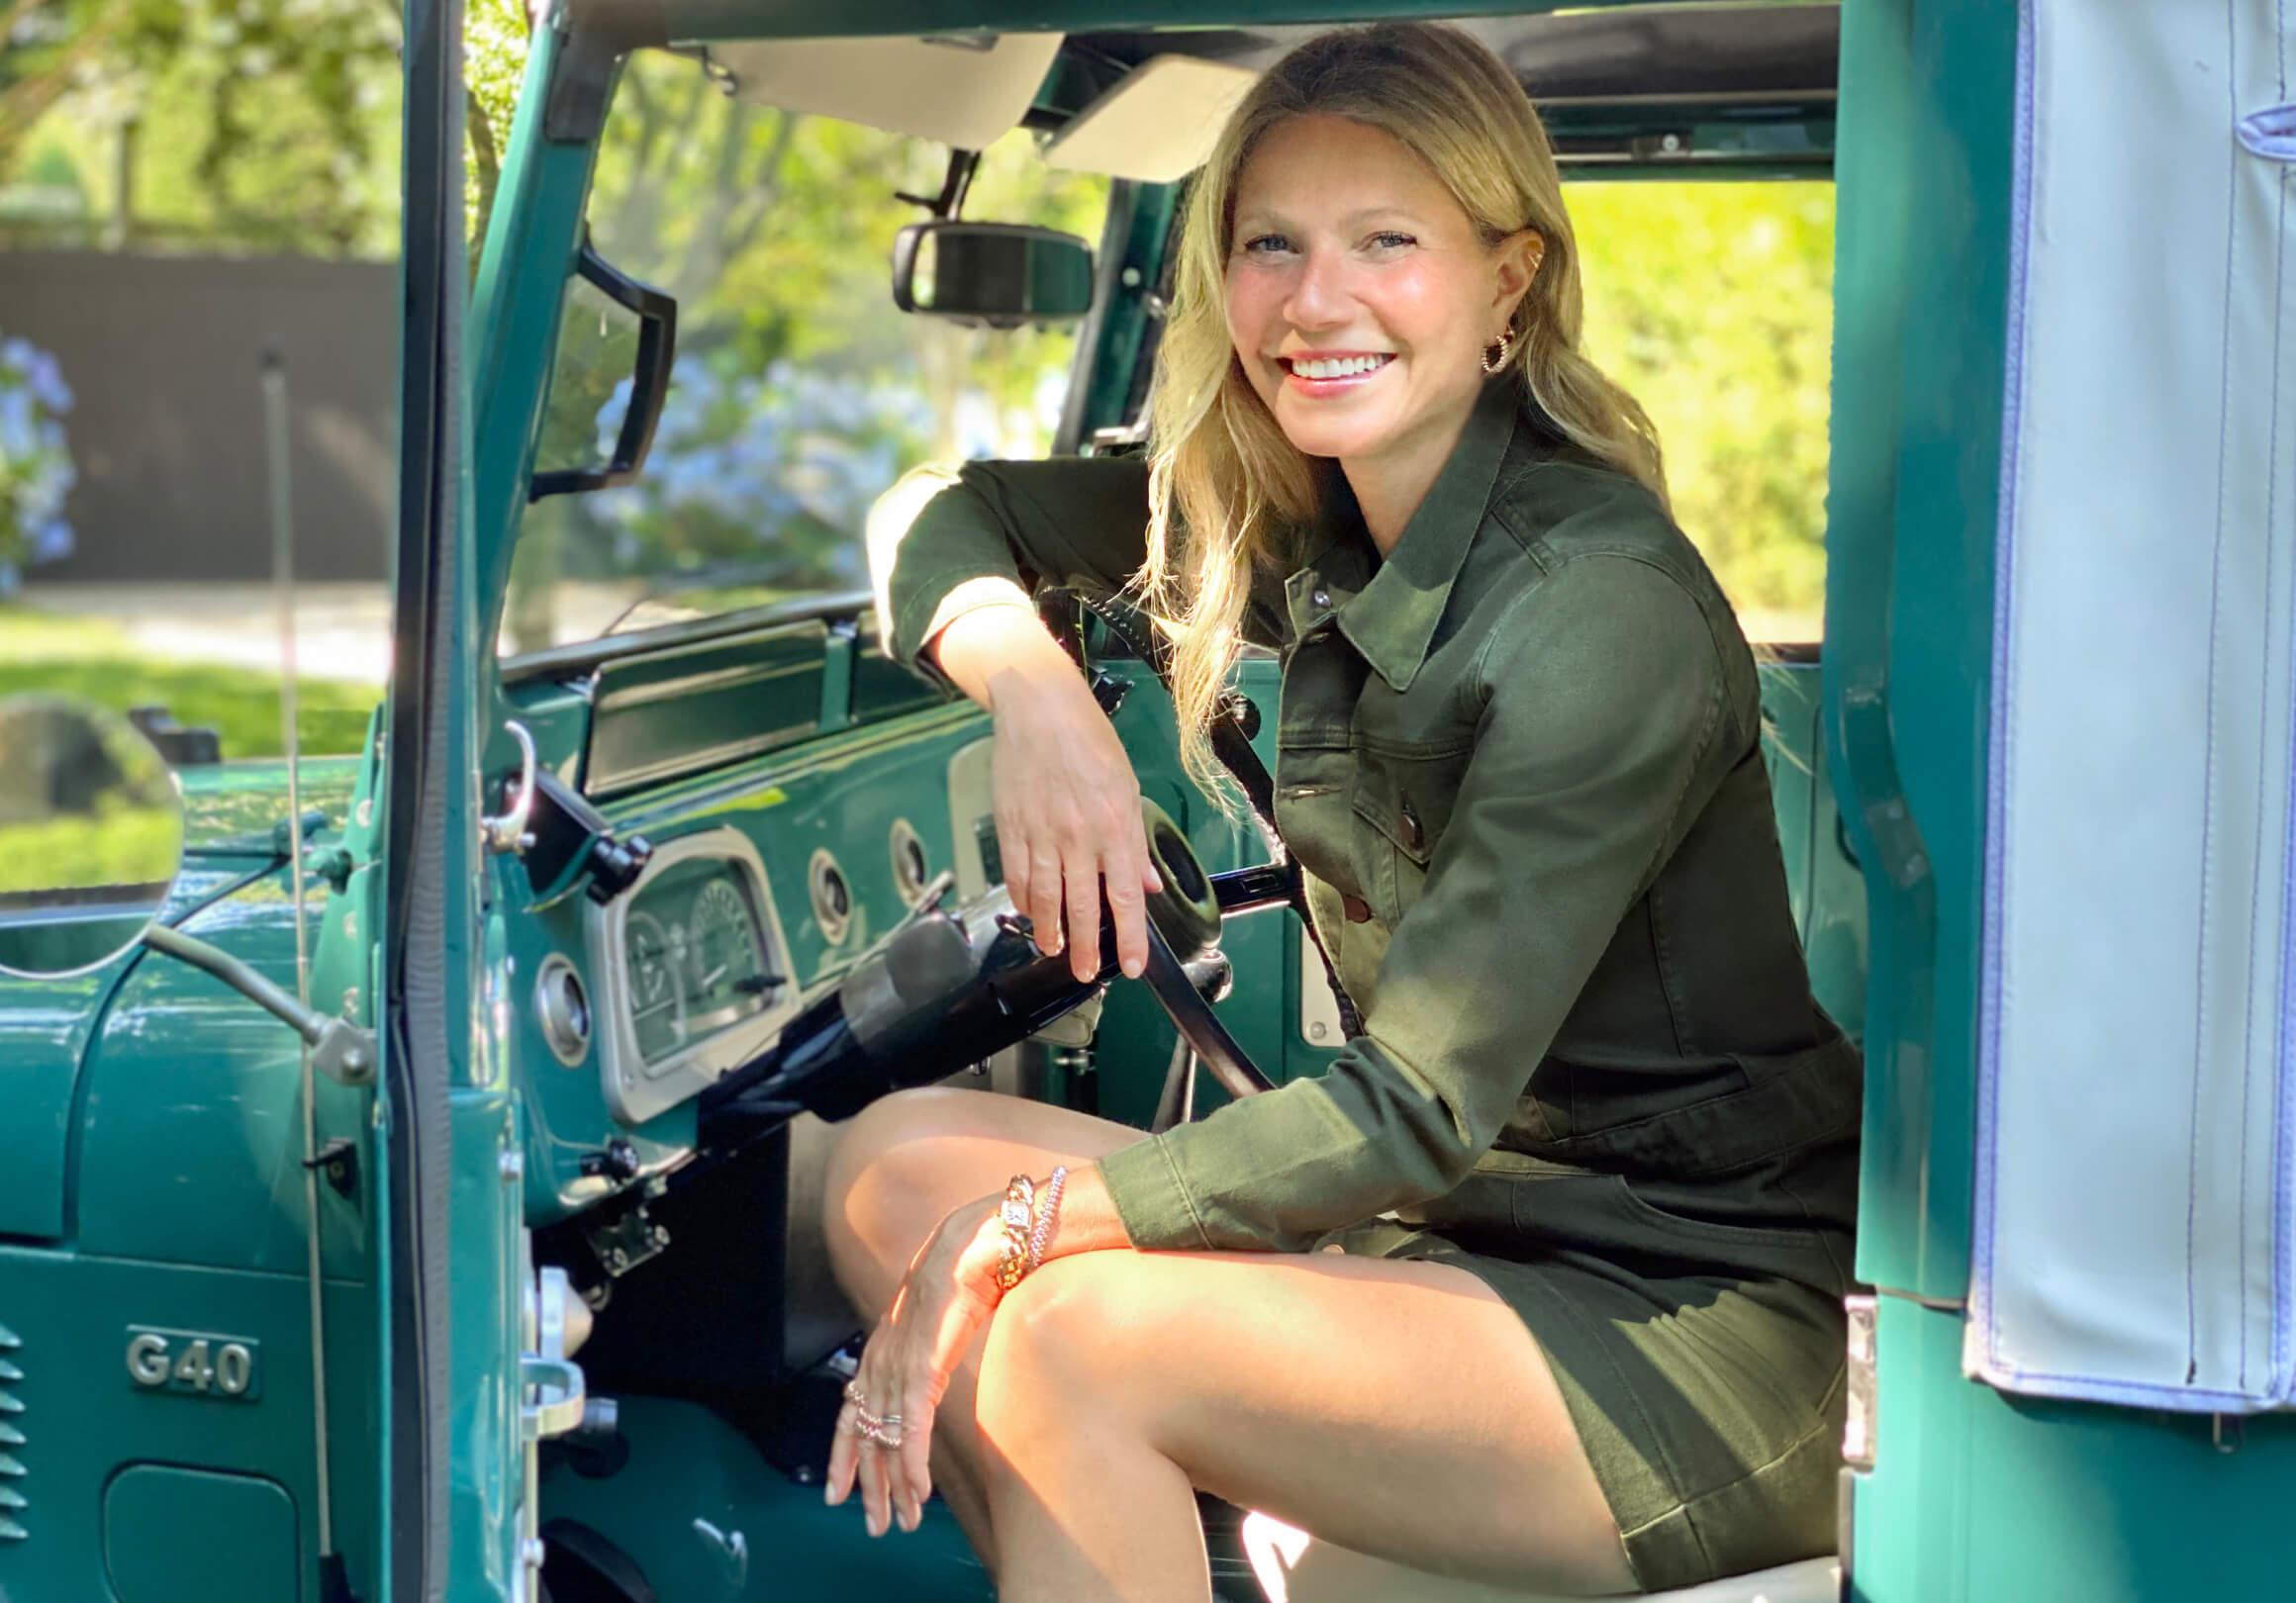 GP posing in a car